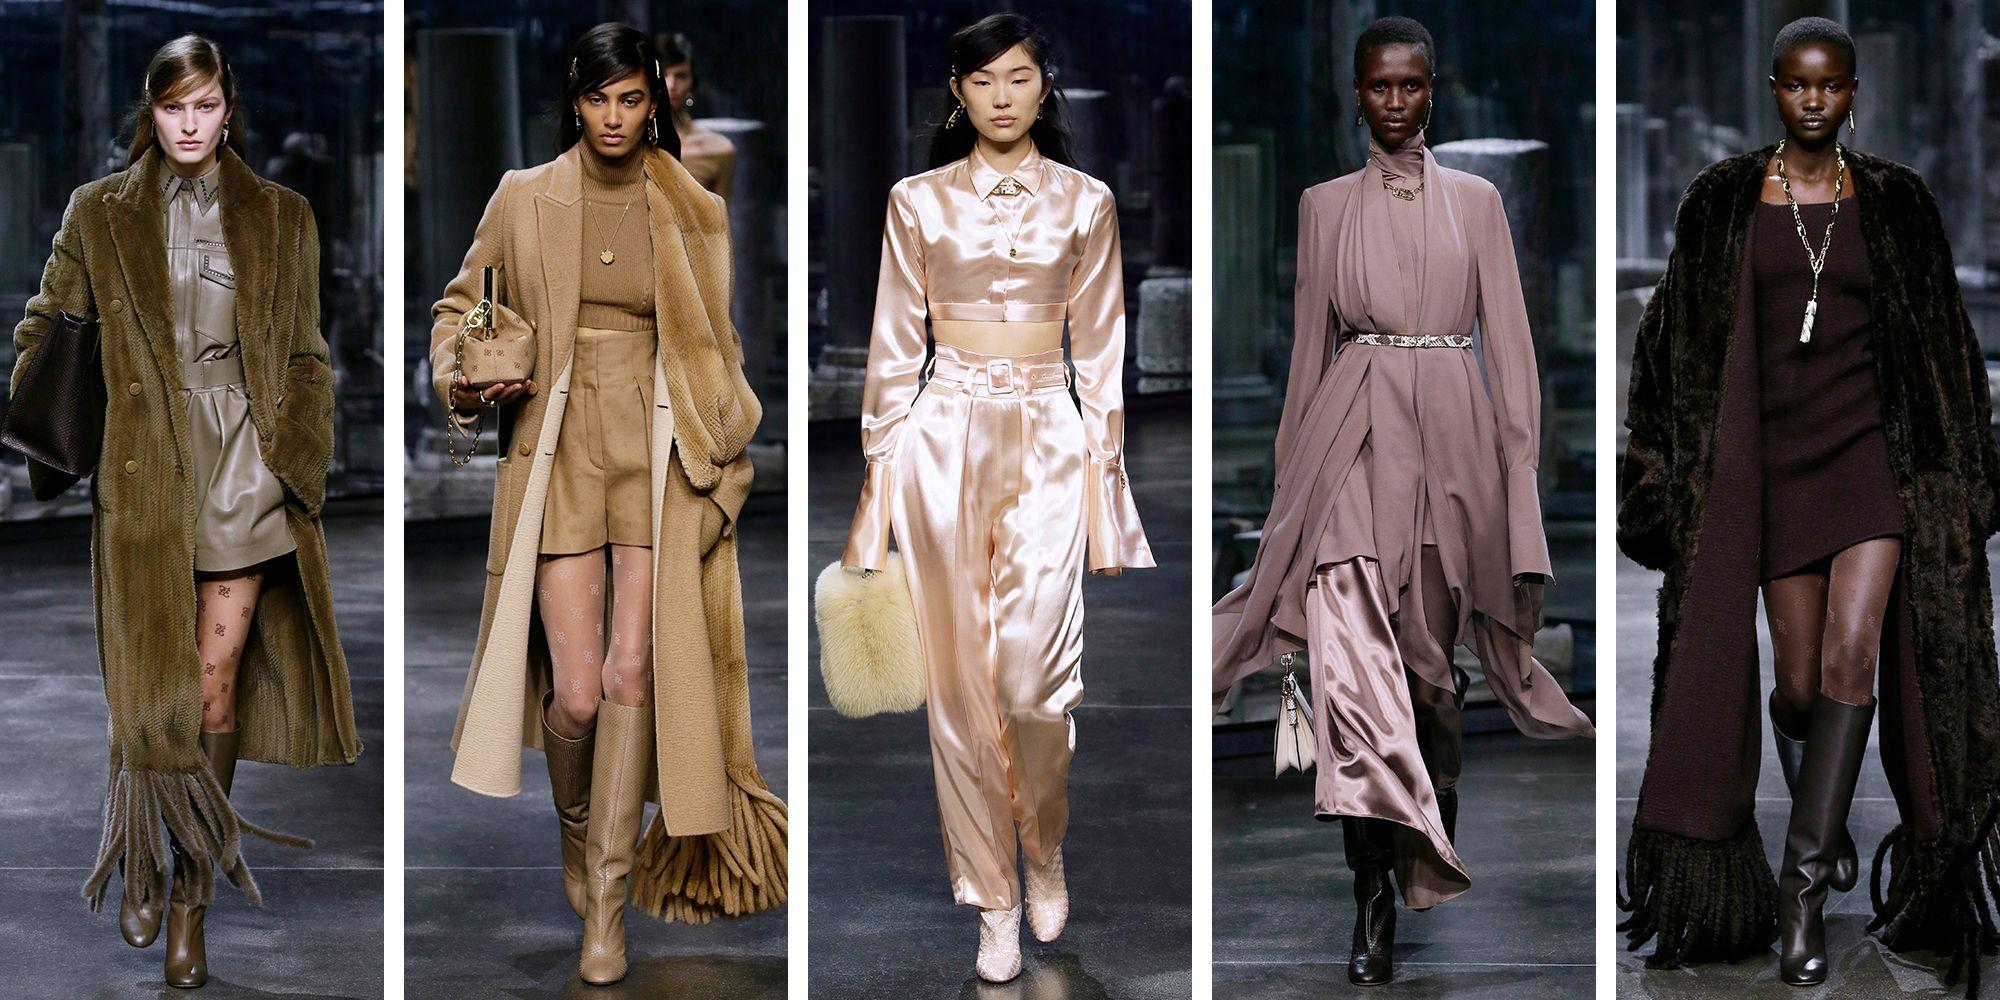 Let's Talk Fashion Image